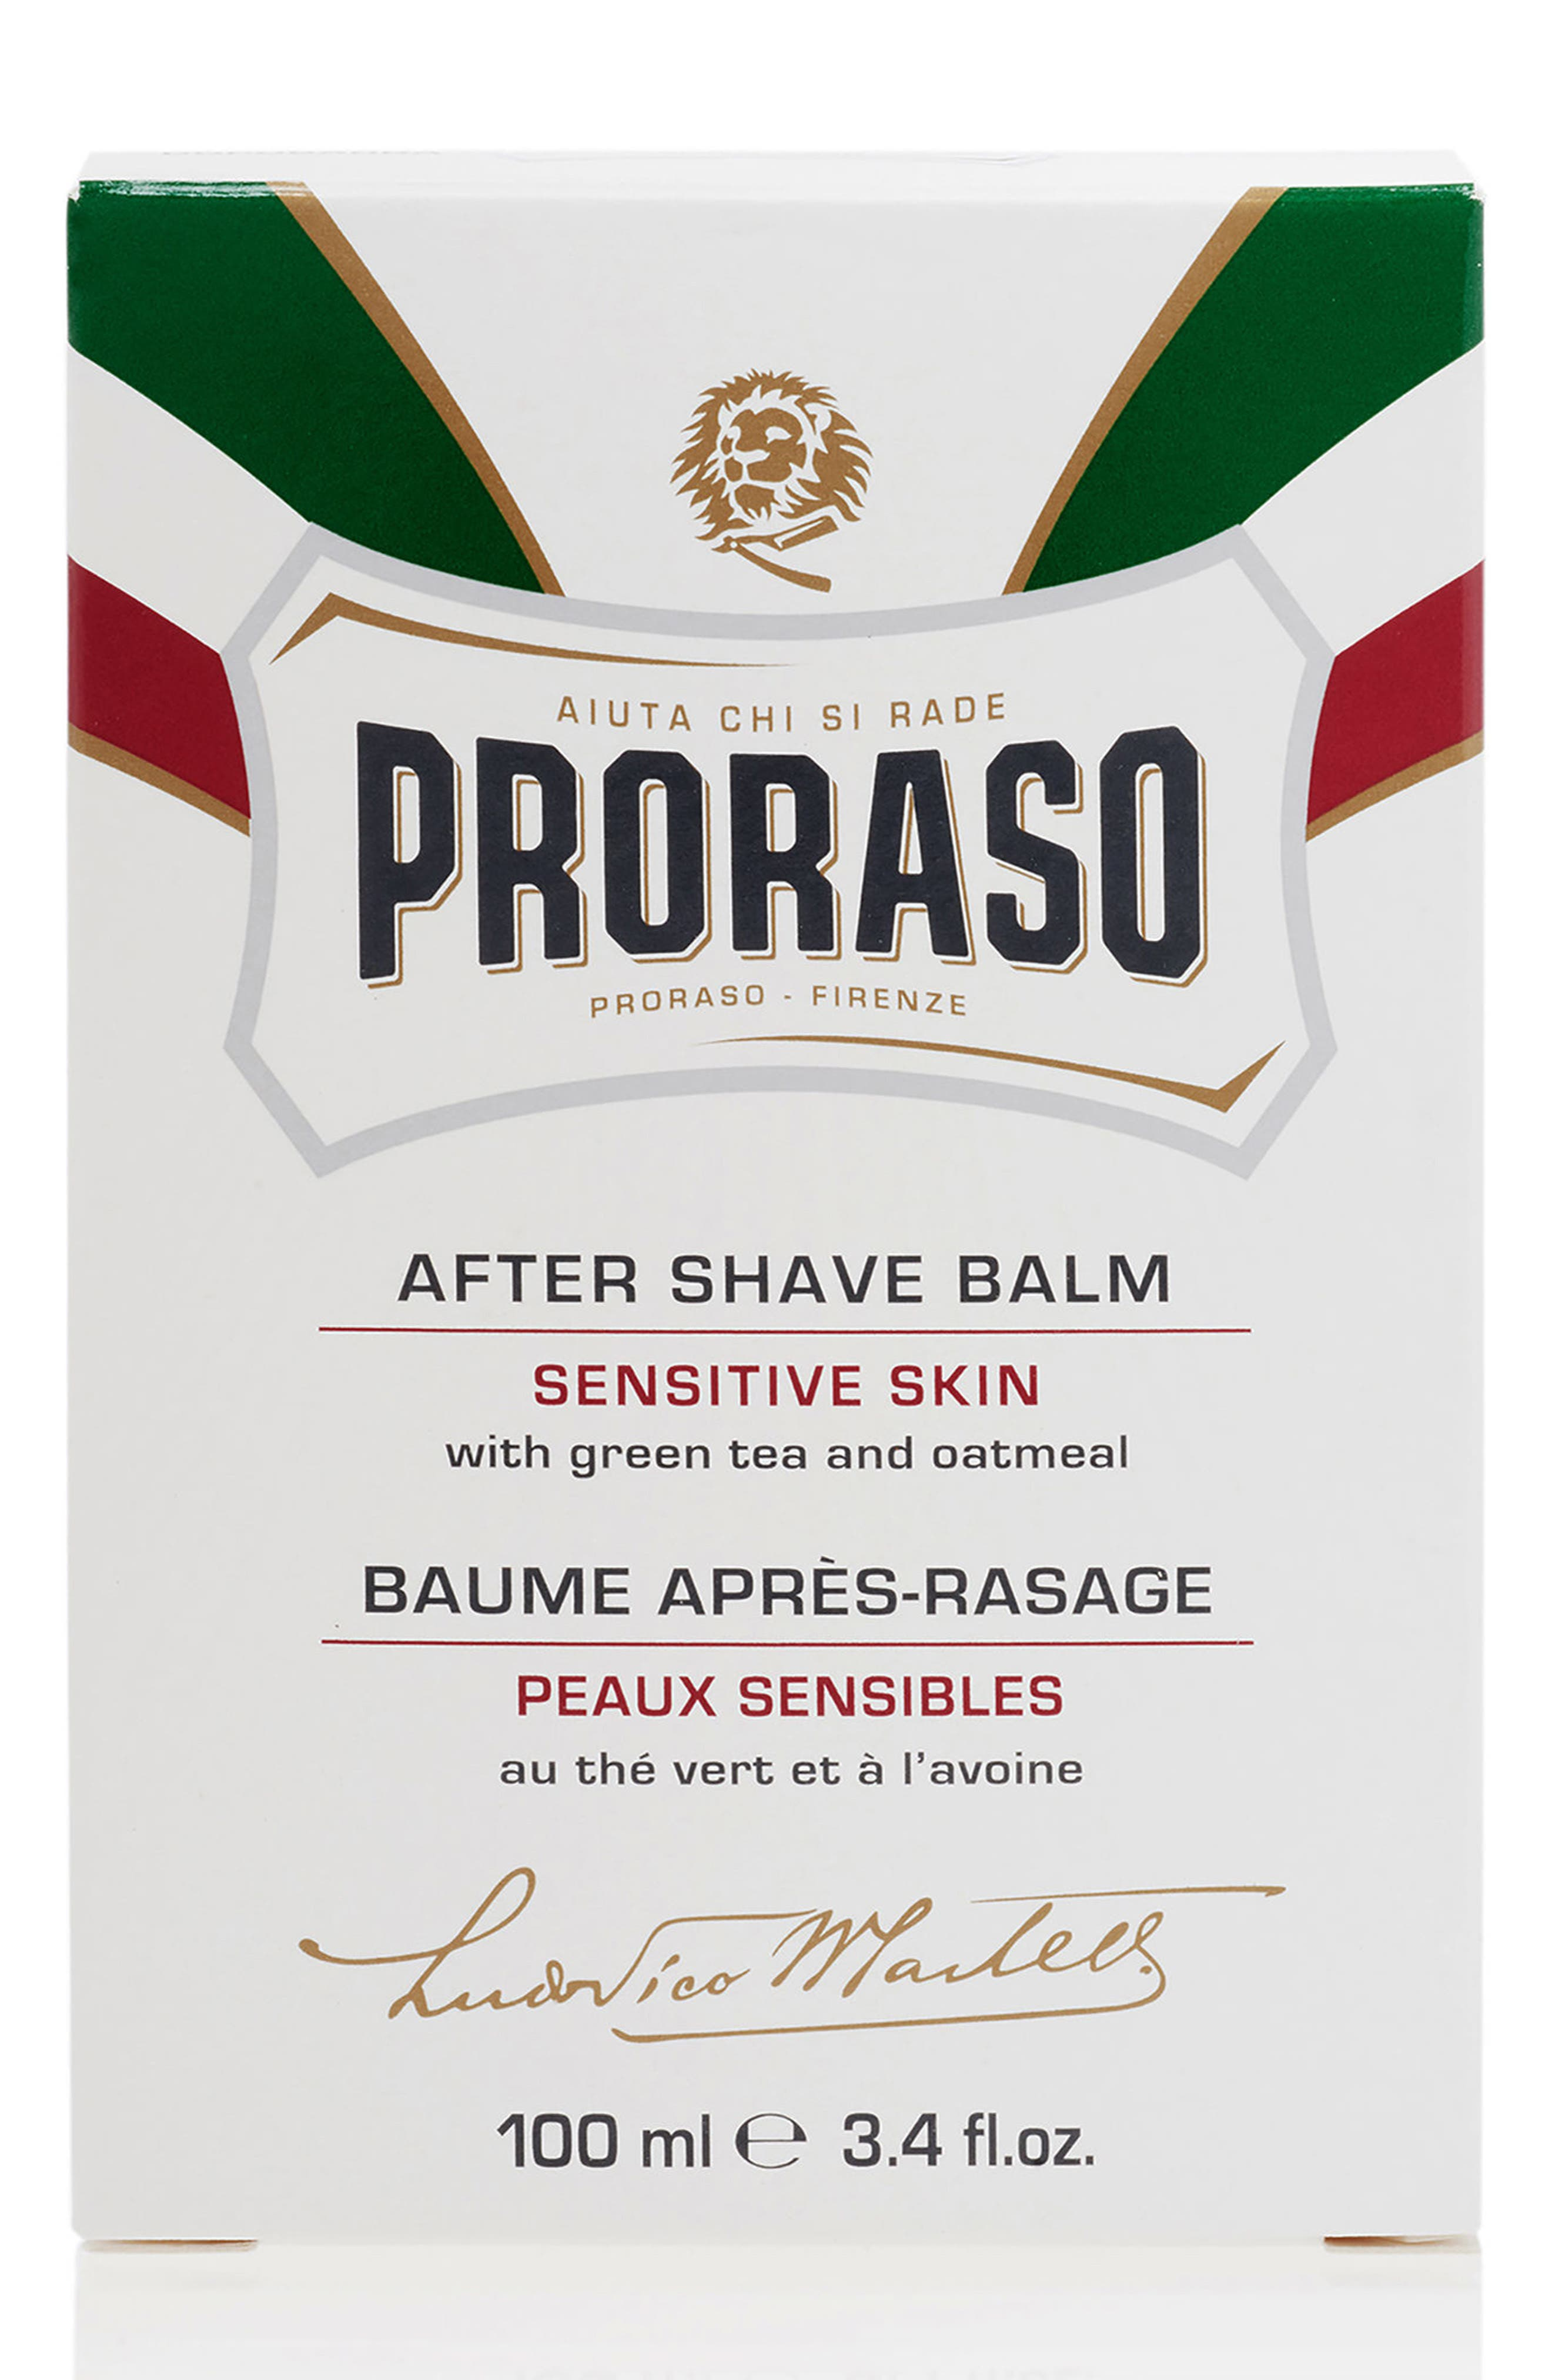 Men's Grooming Shaving Foam for Sensitive Skin,                             Alternate thumbnail 2, color,                             NO COLOR